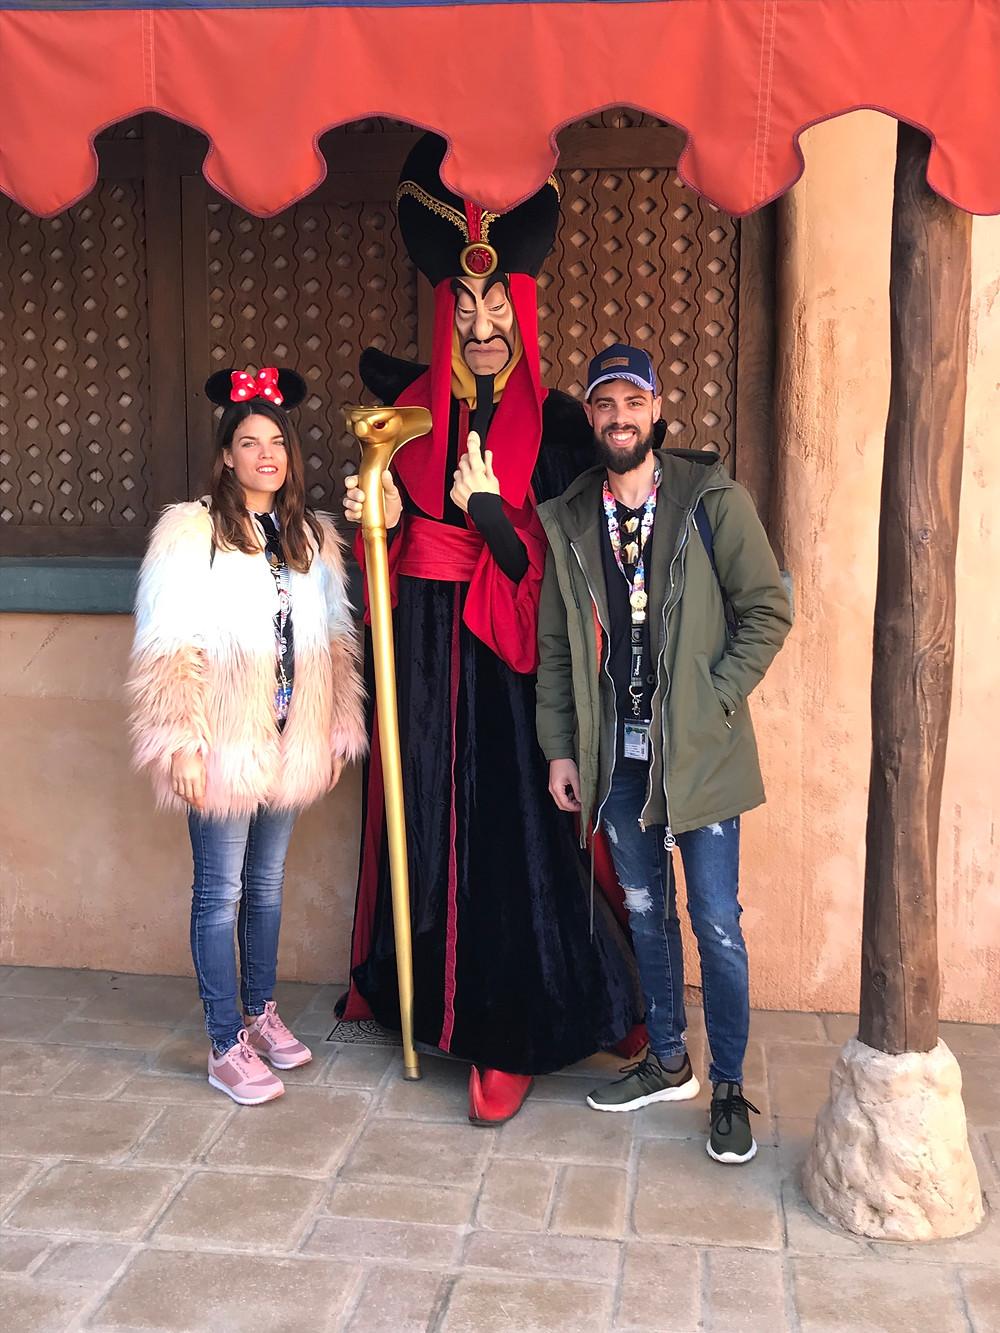 Disneyland paris fotos Rumbo a Disneyland Paris